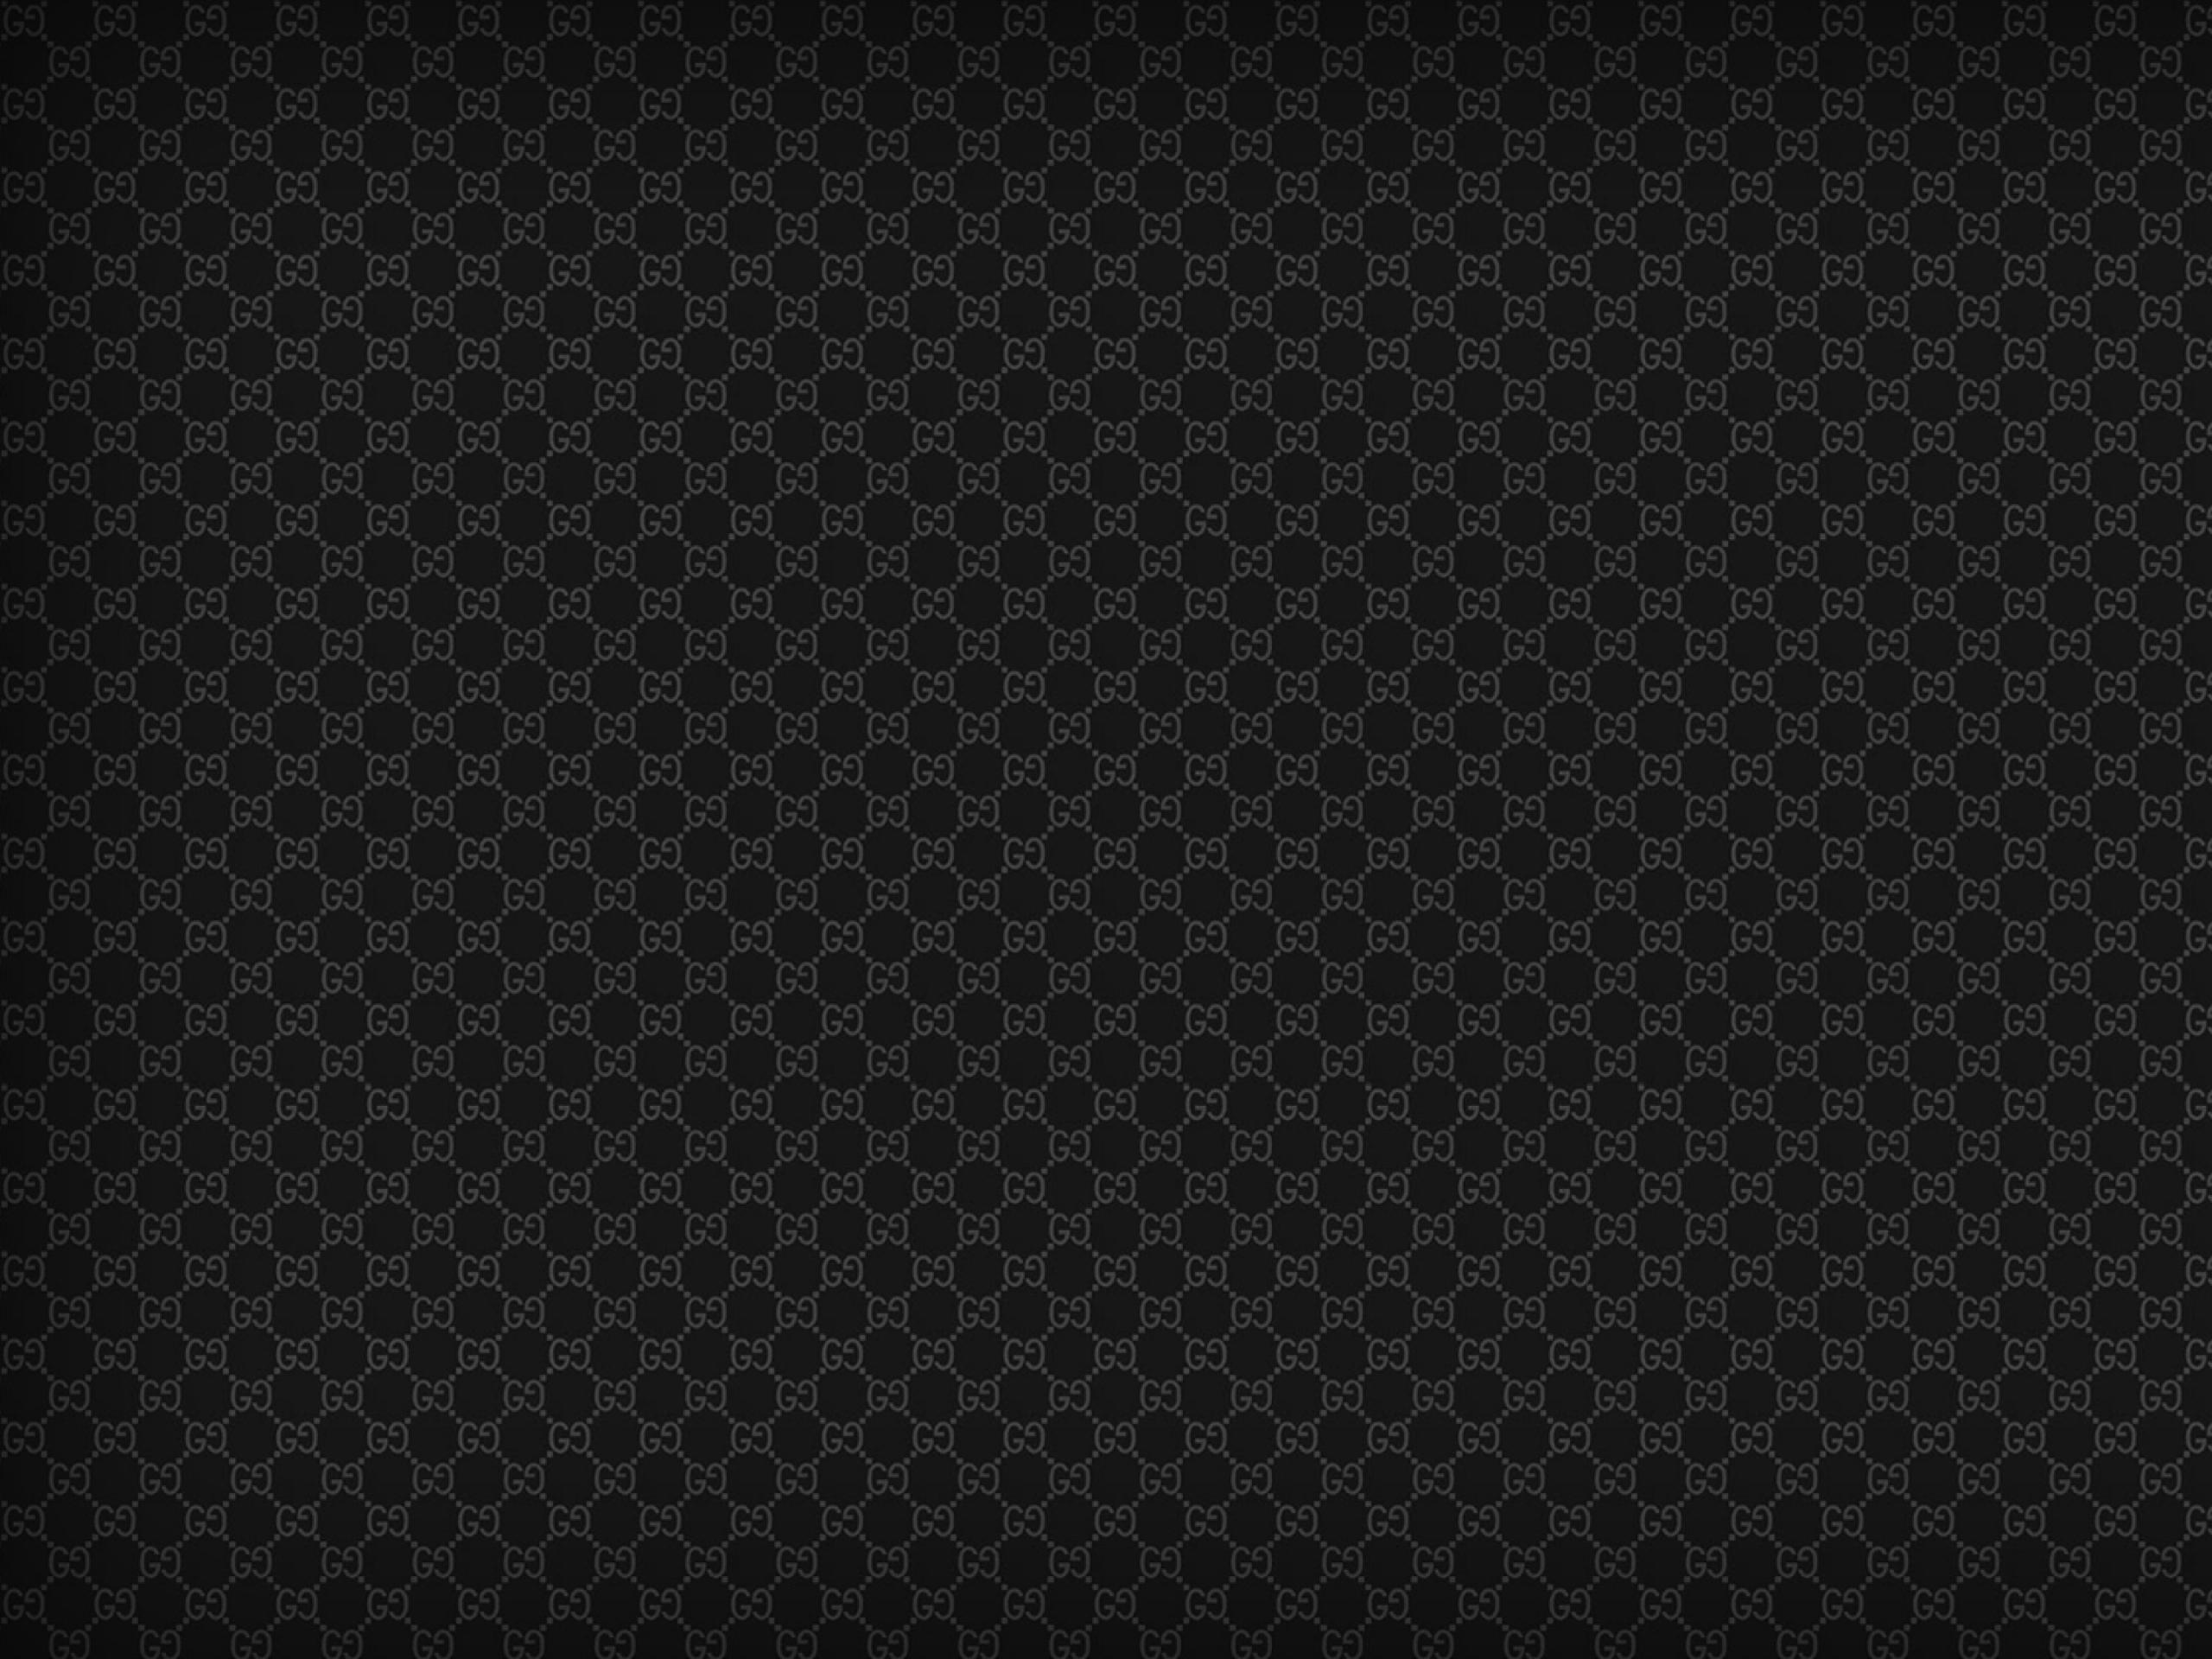 black patterns textures gucci designer label 1922x1080 wallpaper Art 2560x1920